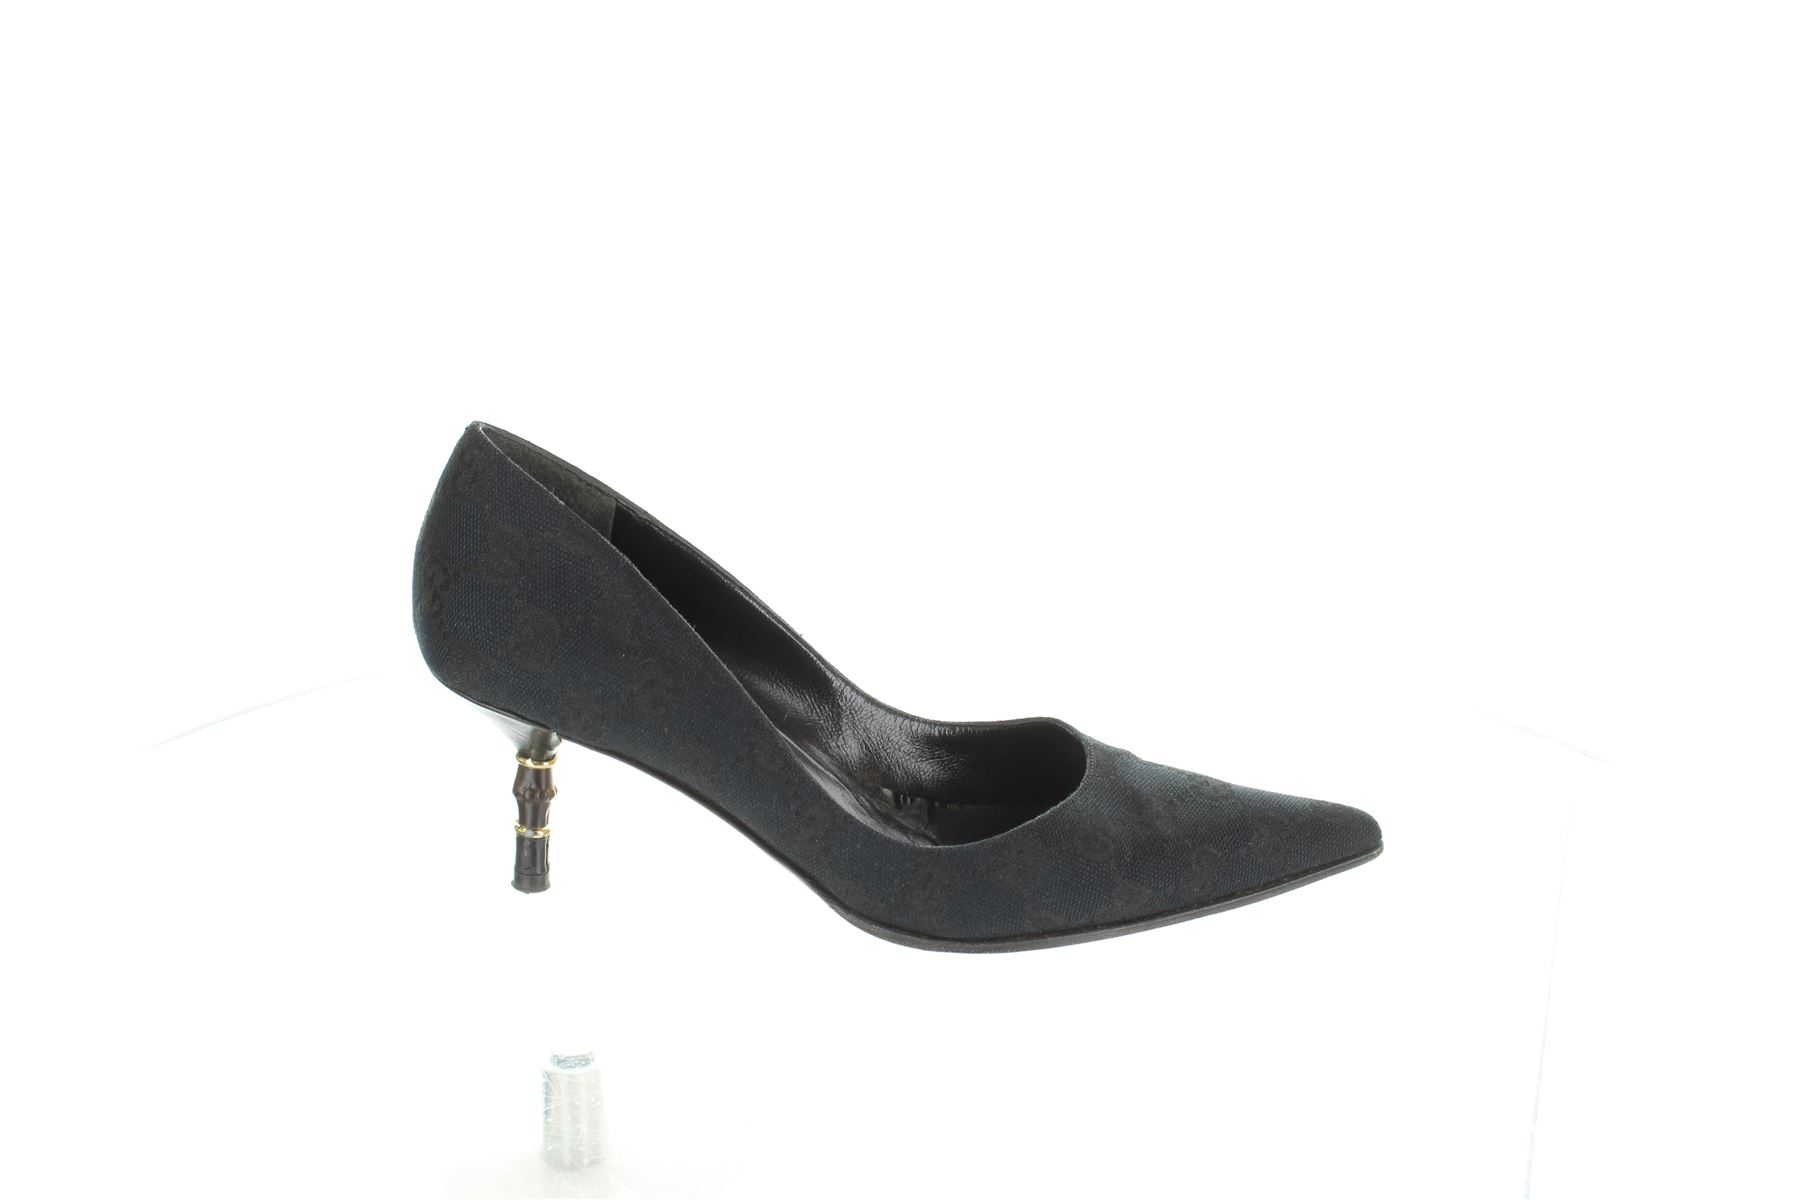 ee4487610f GUCCI Panno nero scarpe tacco basso, UK 2 US 5 EU 35   eBay